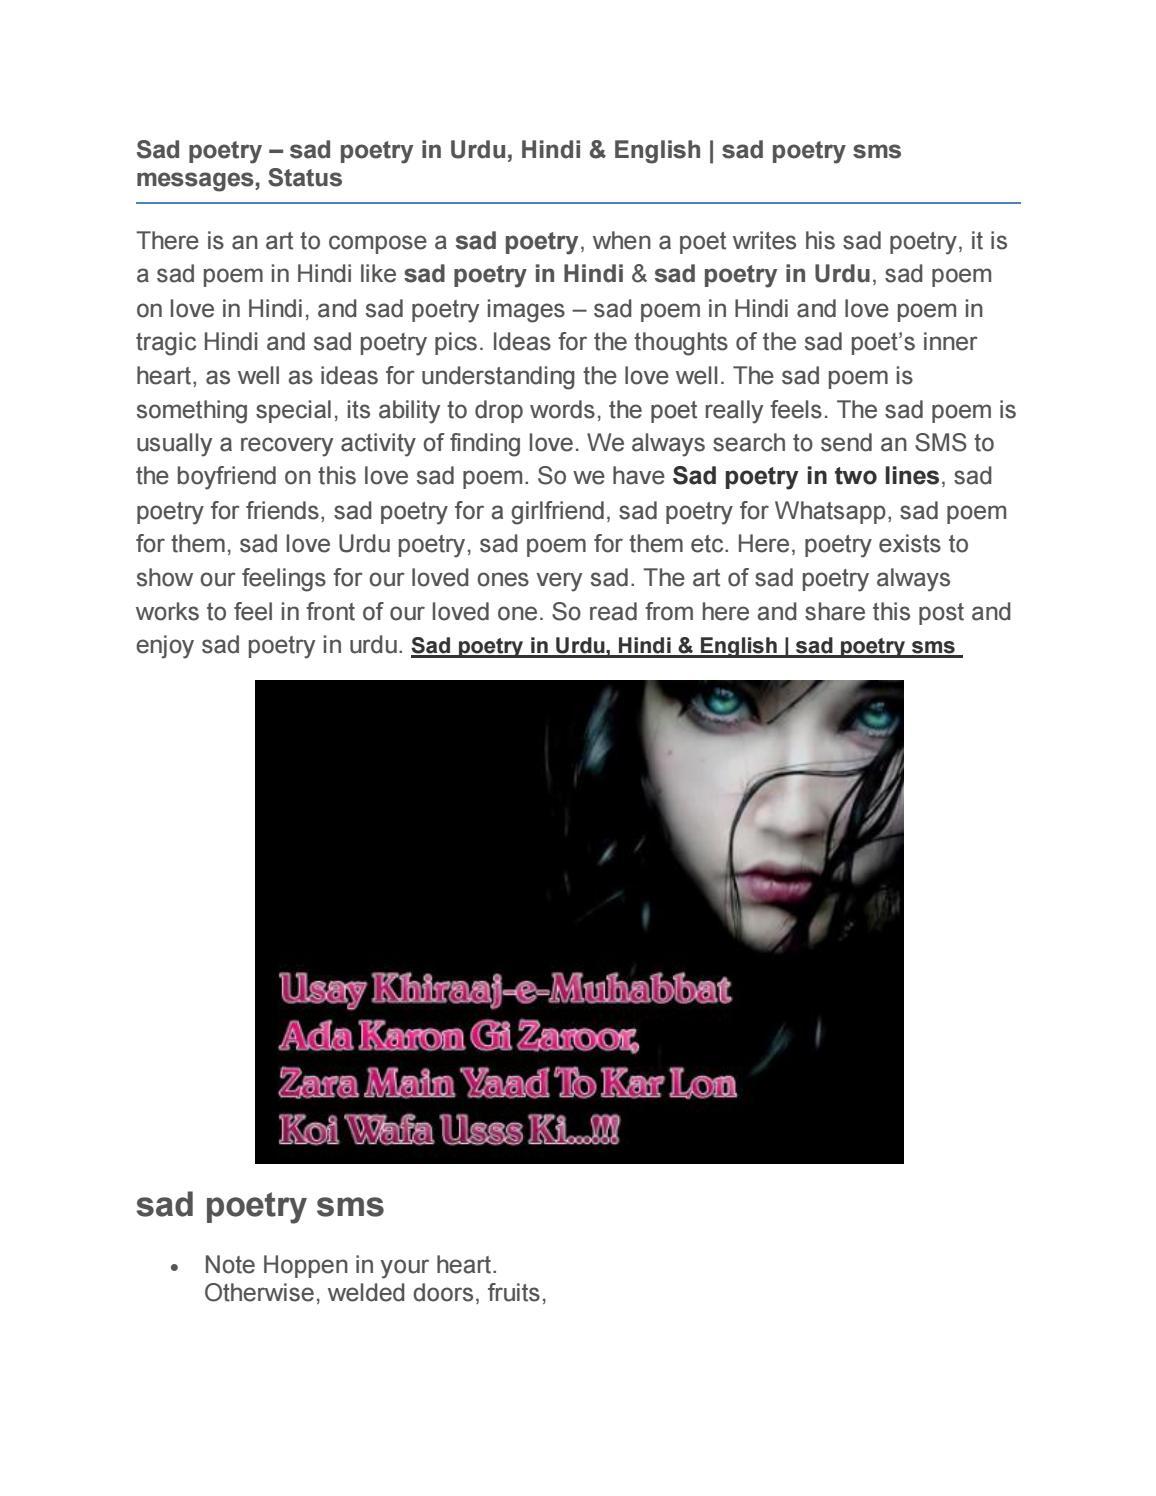 sad poetry sms - Sad poetry – sad poetry in Urdu, Hindi